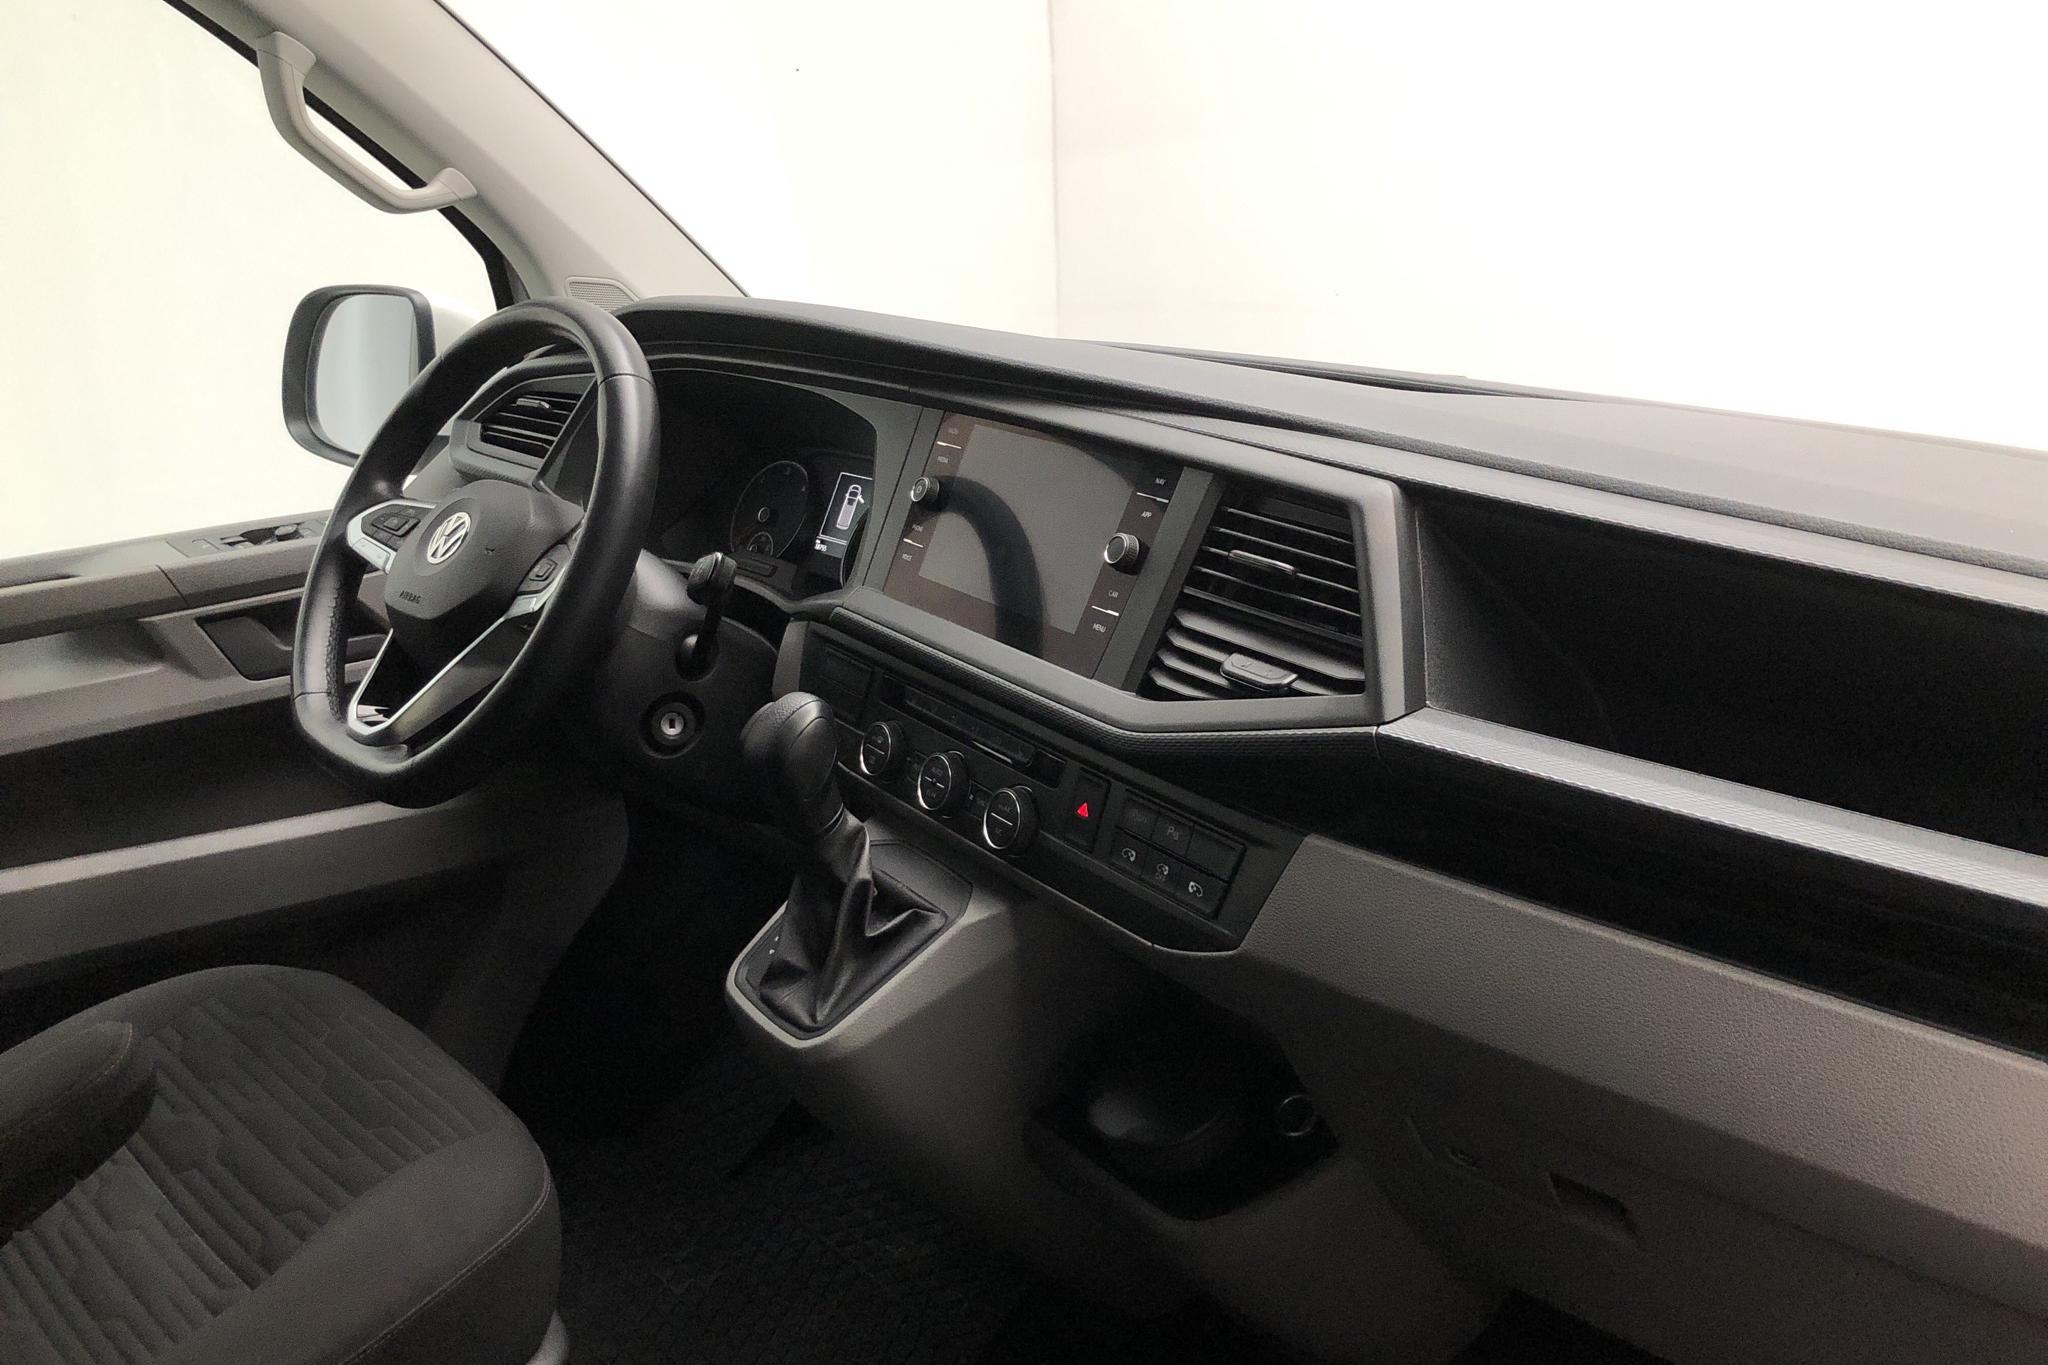 VW Caravelle T6 2.0 TDI BMT (150hk) - 18 740 km - Automatic - white - 2020